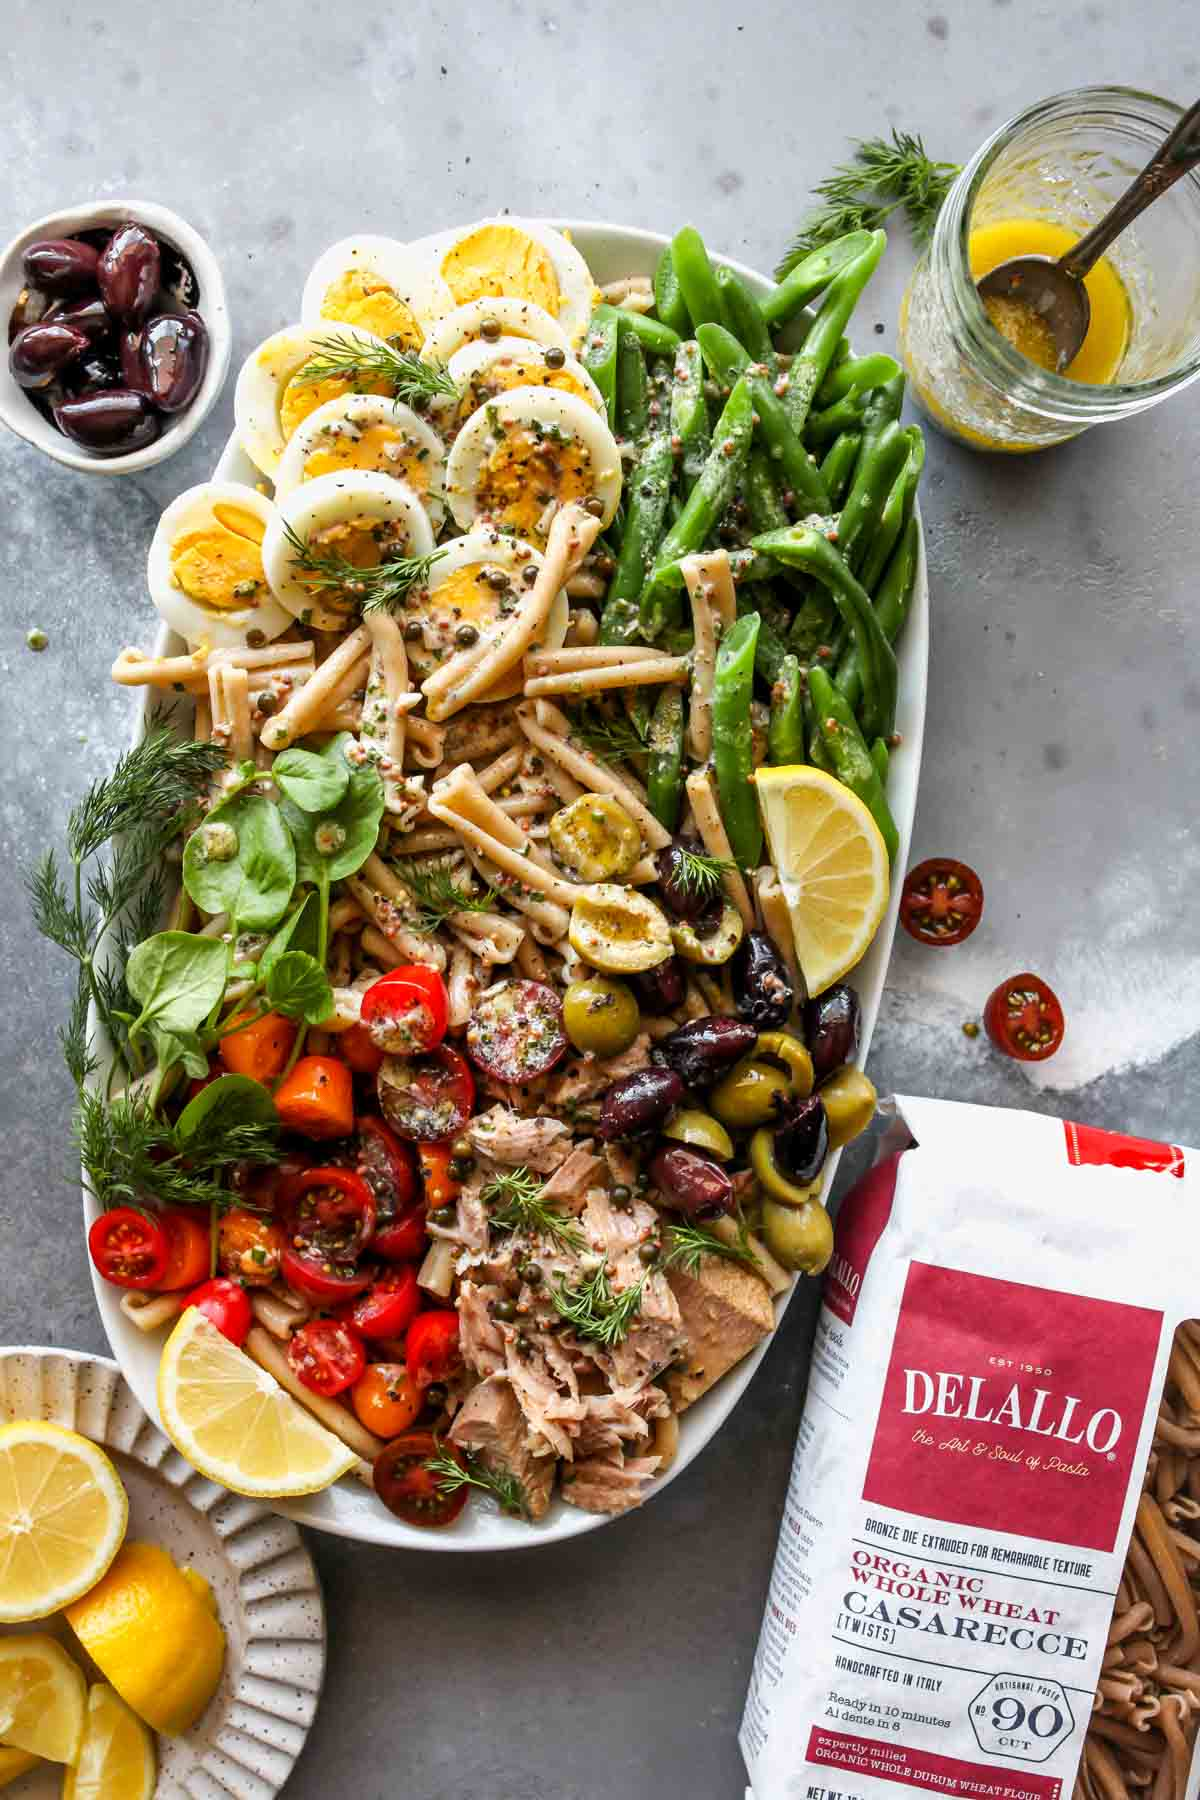 DeLallo pasta bag next to a platter of Niçoise Pasta Salad